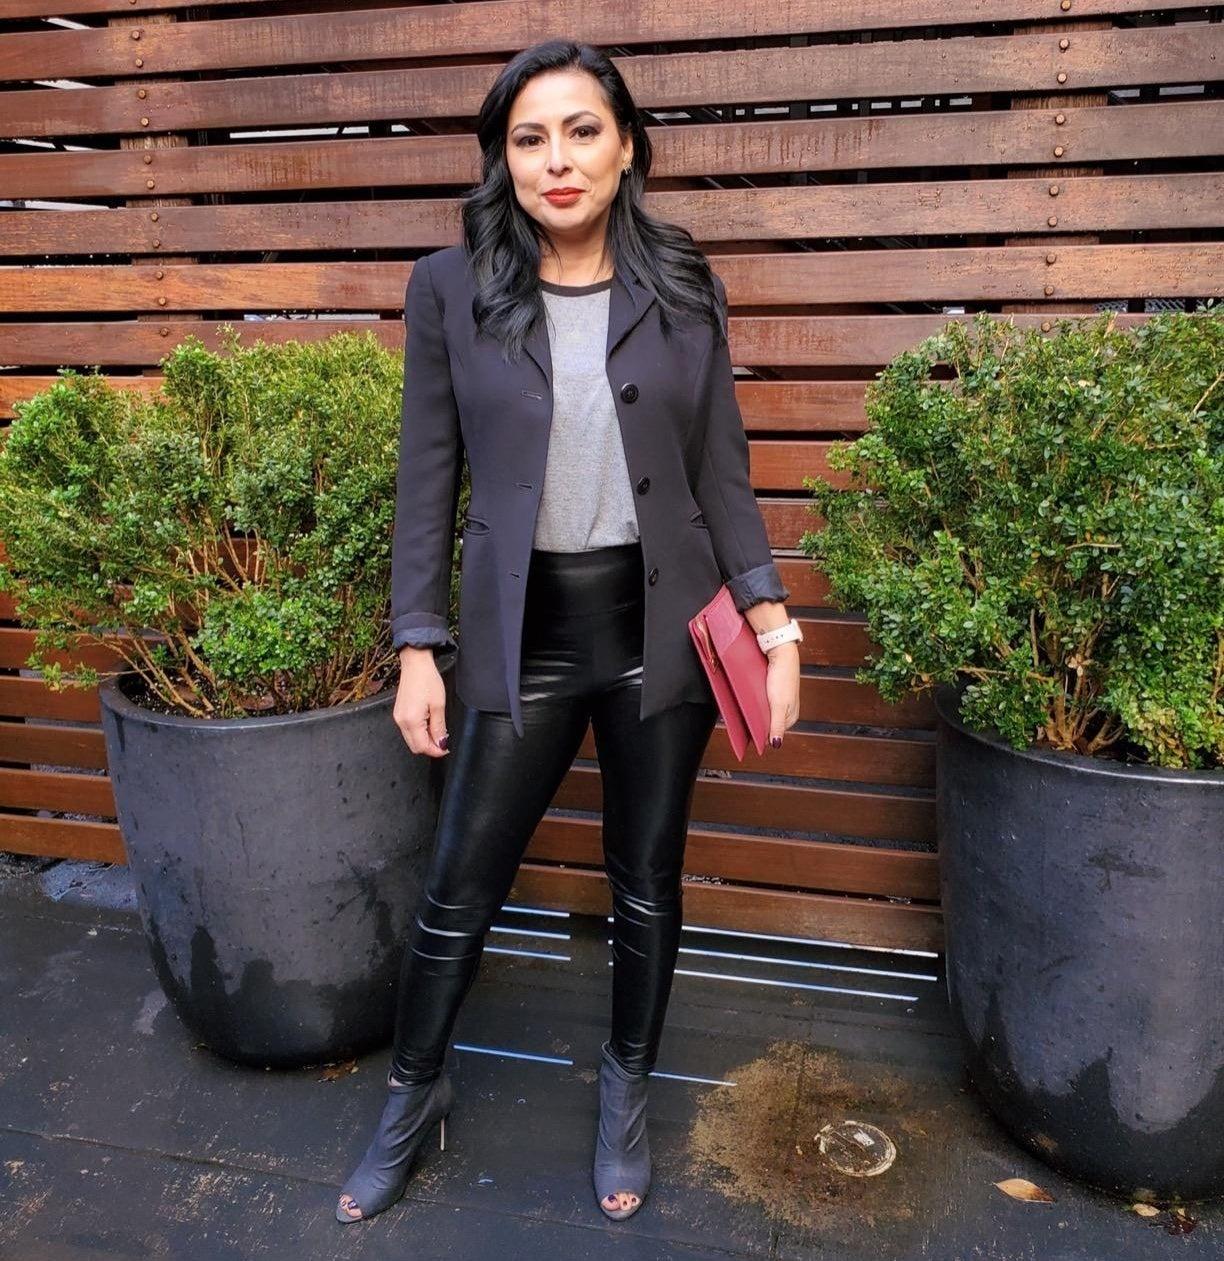 Reviewer wearing faux leather leggings in black